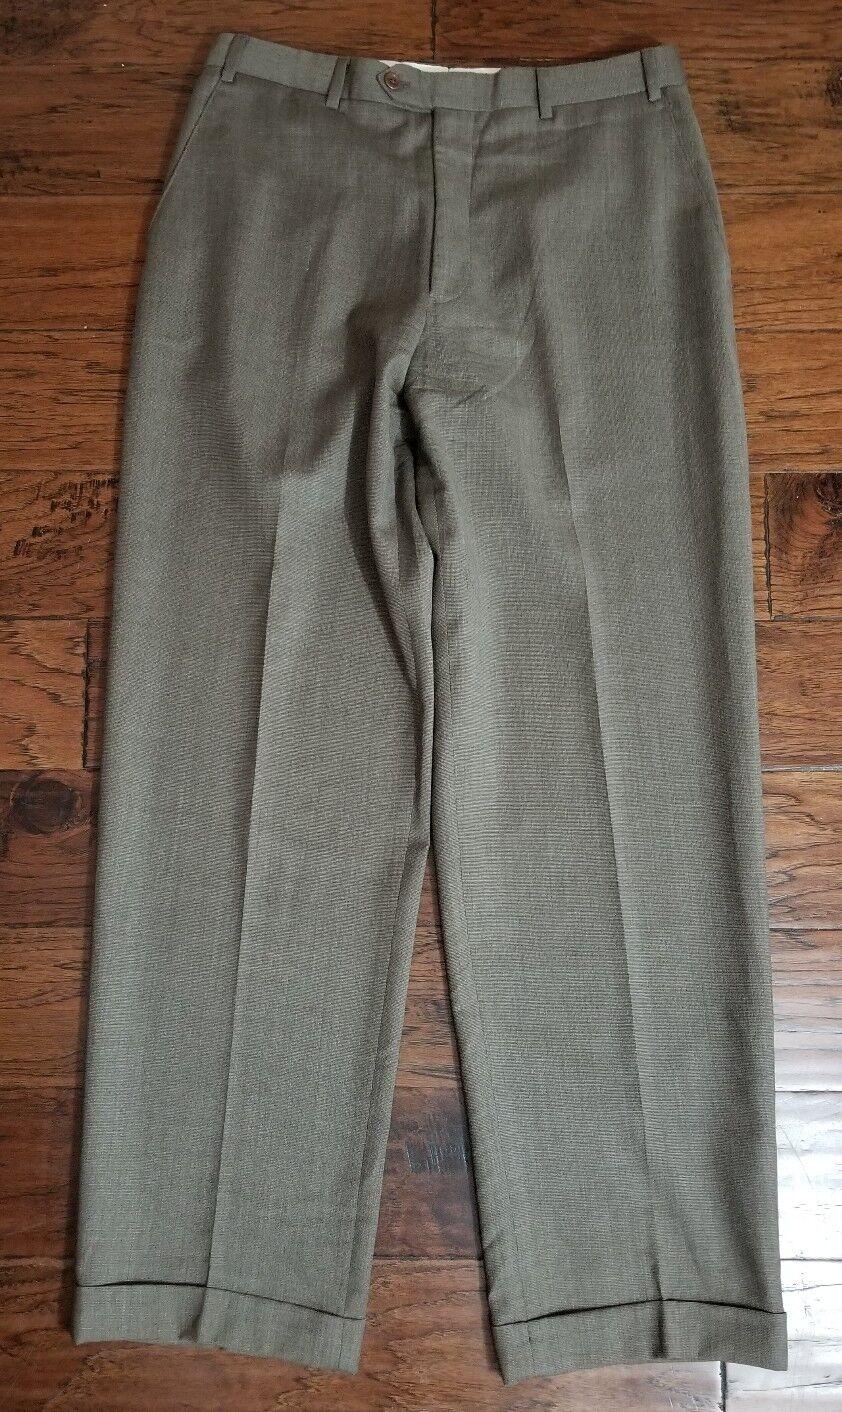 Men's Armani Collezioni Brown Weave Wool Flat Front Pants Sz 34 Inseam 3.5  Euc